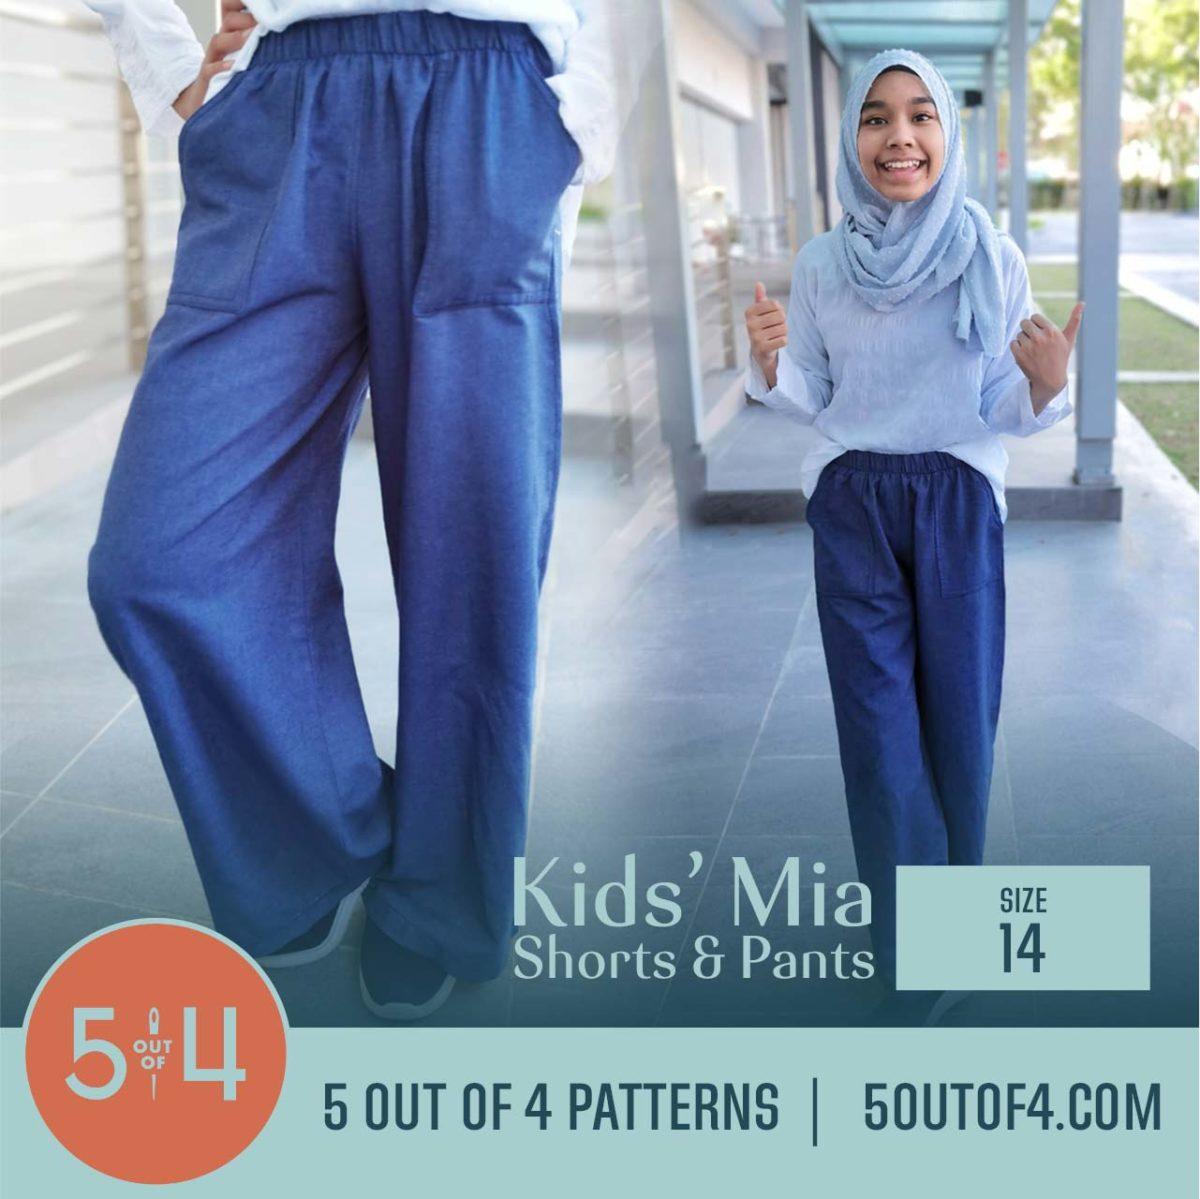 5oo4 Patterns Kids' Mia Pants Size 14